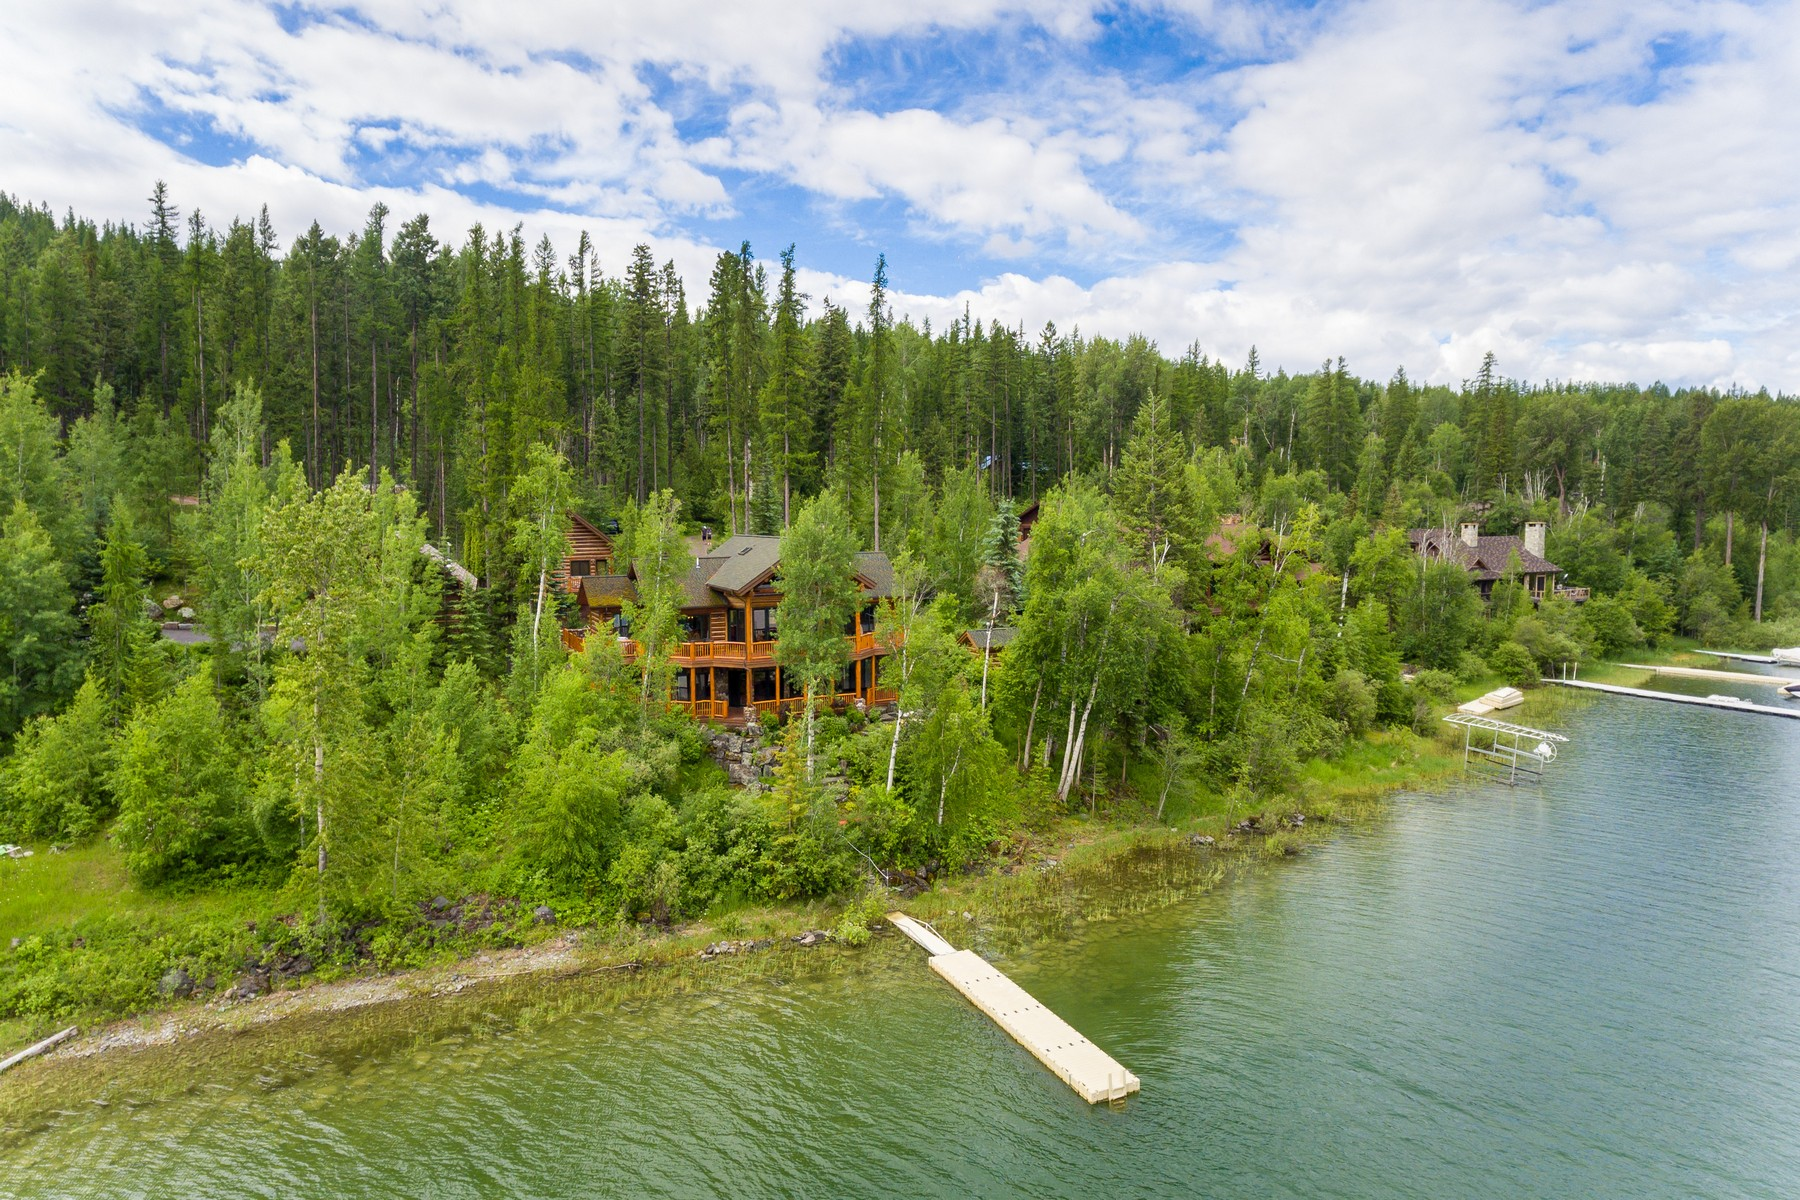 独户住宅 为 销售 在 707 Delrey Road, Whitefish, MT 59937 707 Delrey Rd 怀特菲什, 蒙大拿州, 59937 美国